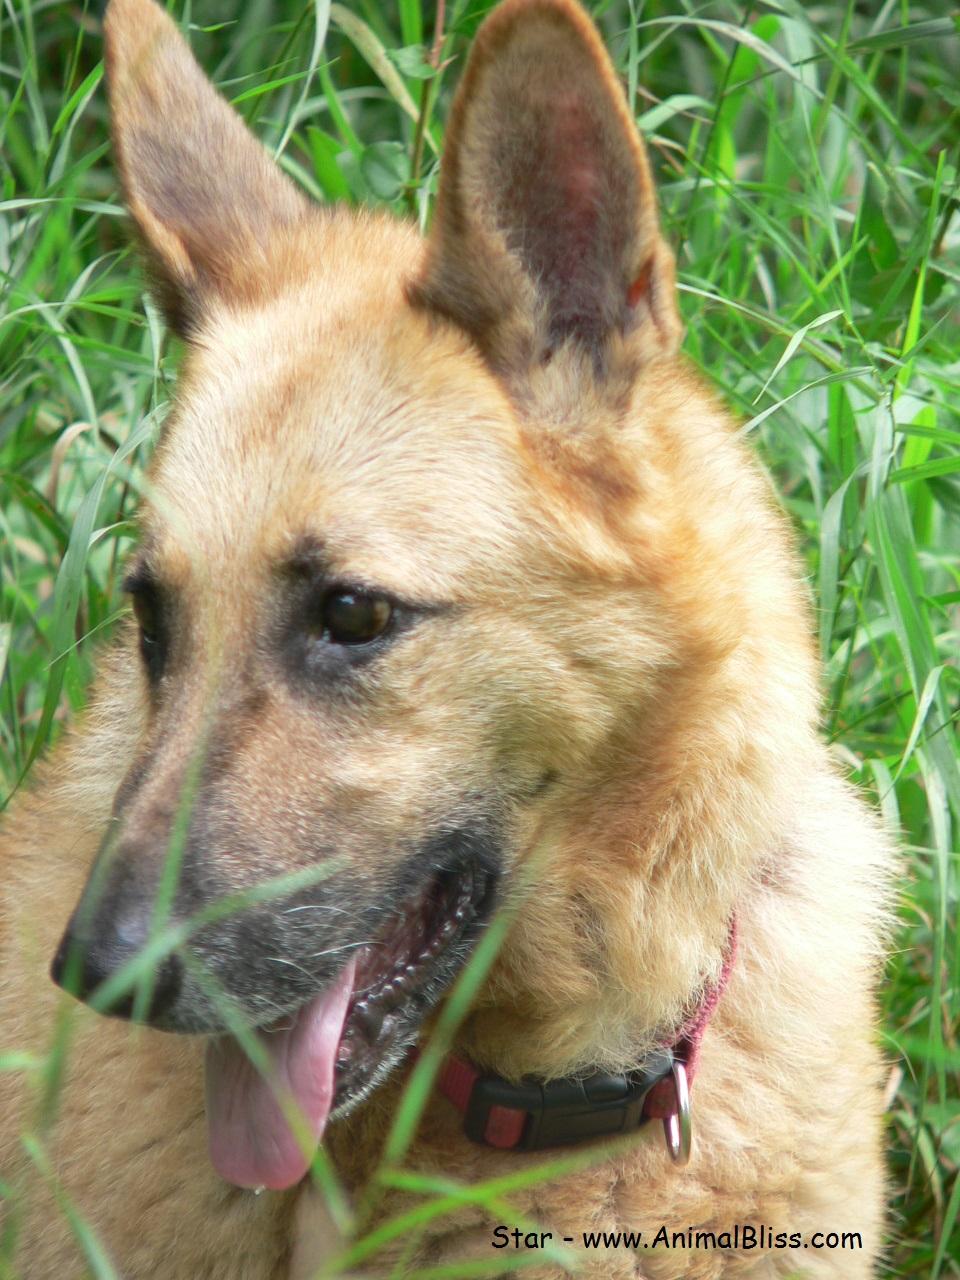 Canine Osteosarcoma : Bone Cancer in Dogs